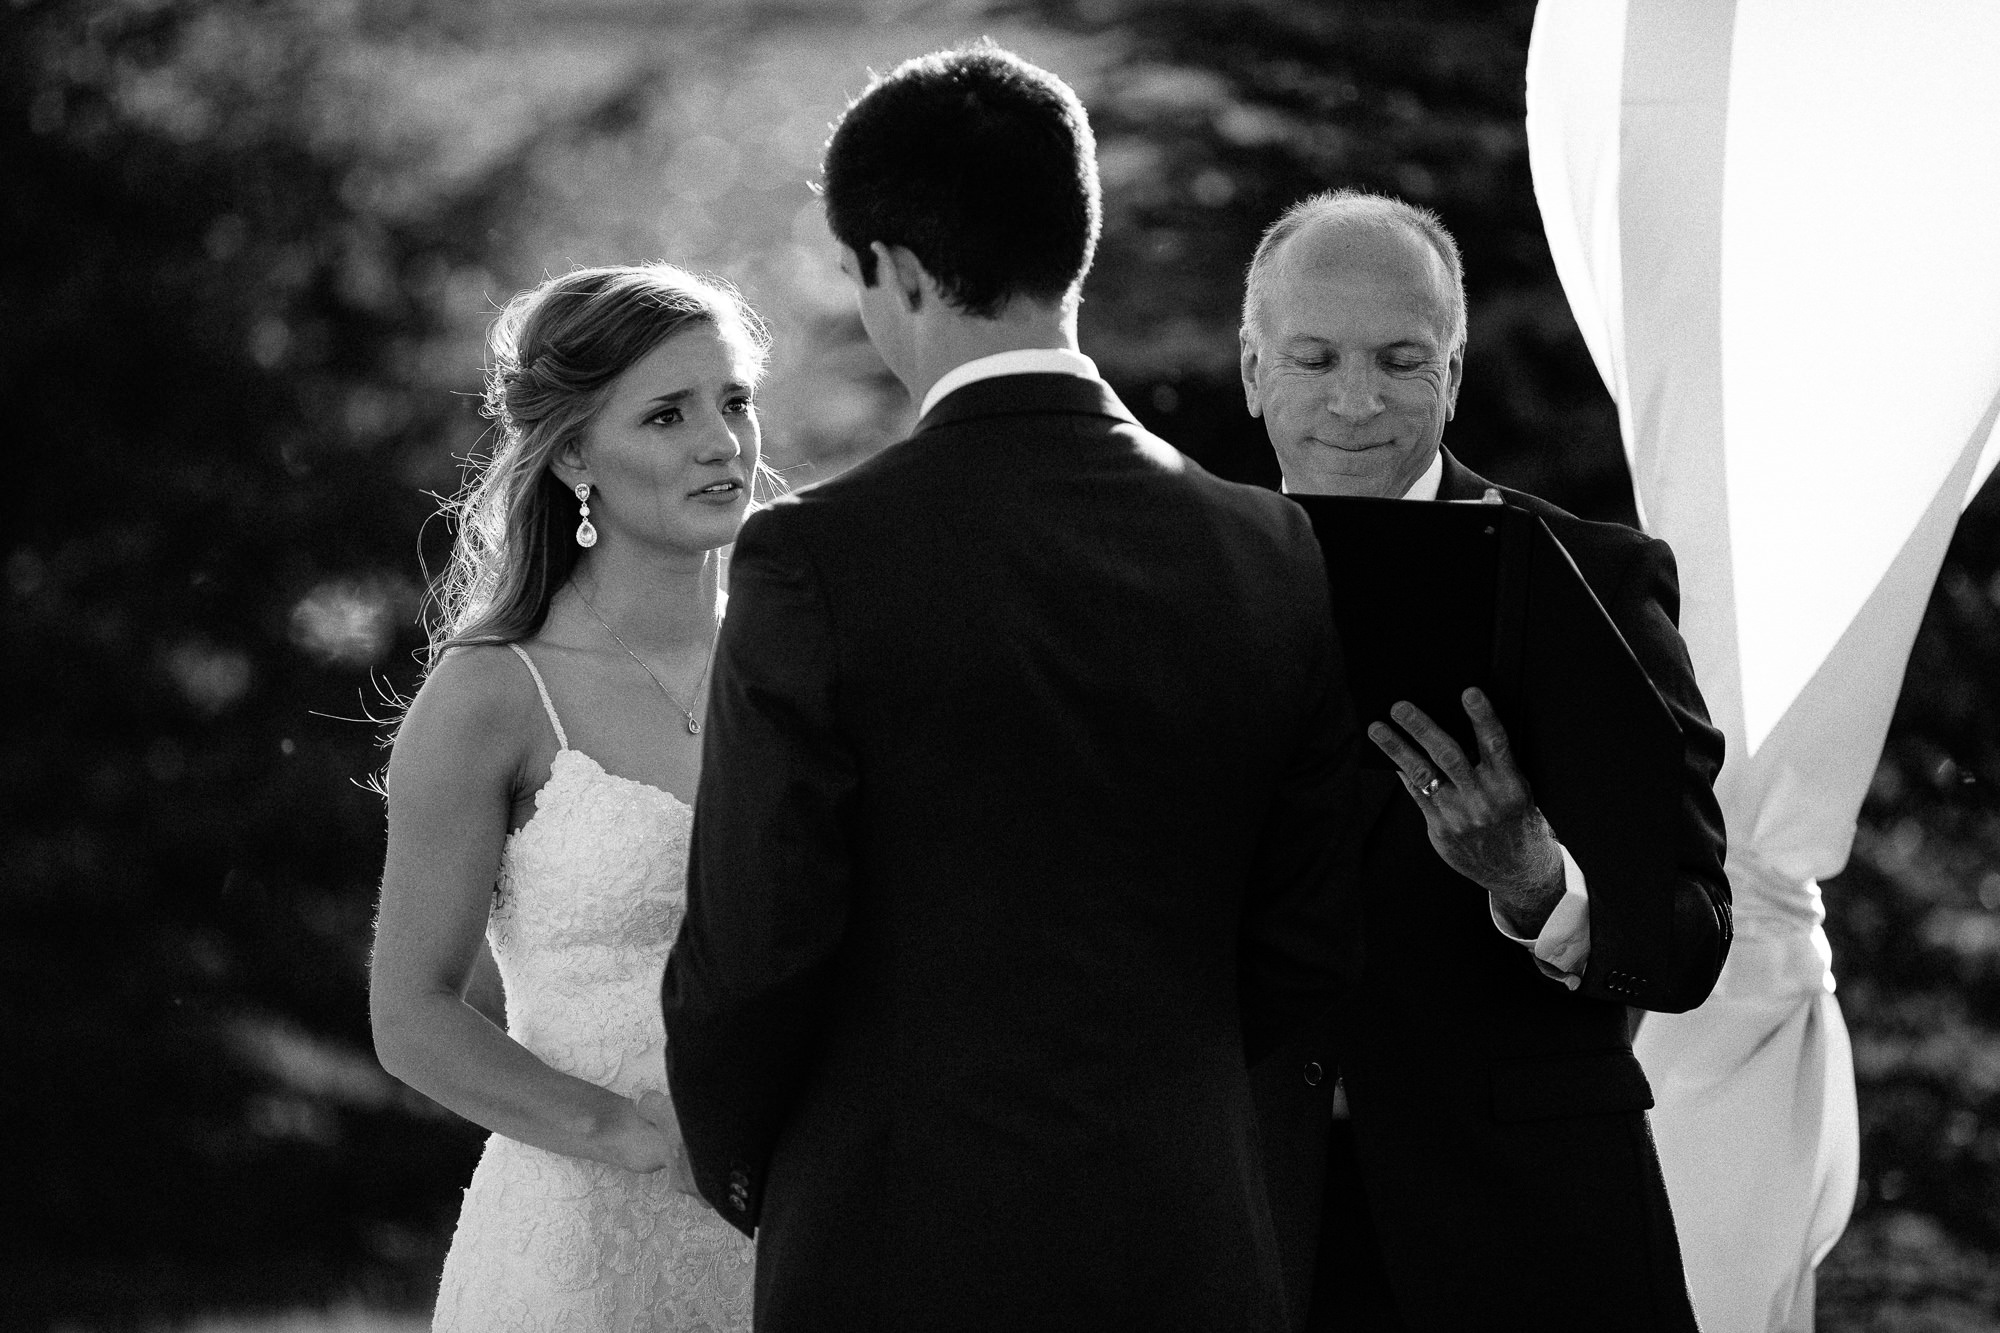 wedding-elopement-adventerous-romantic-timeless-south-dakota-blue-haven-barn-047.jpg